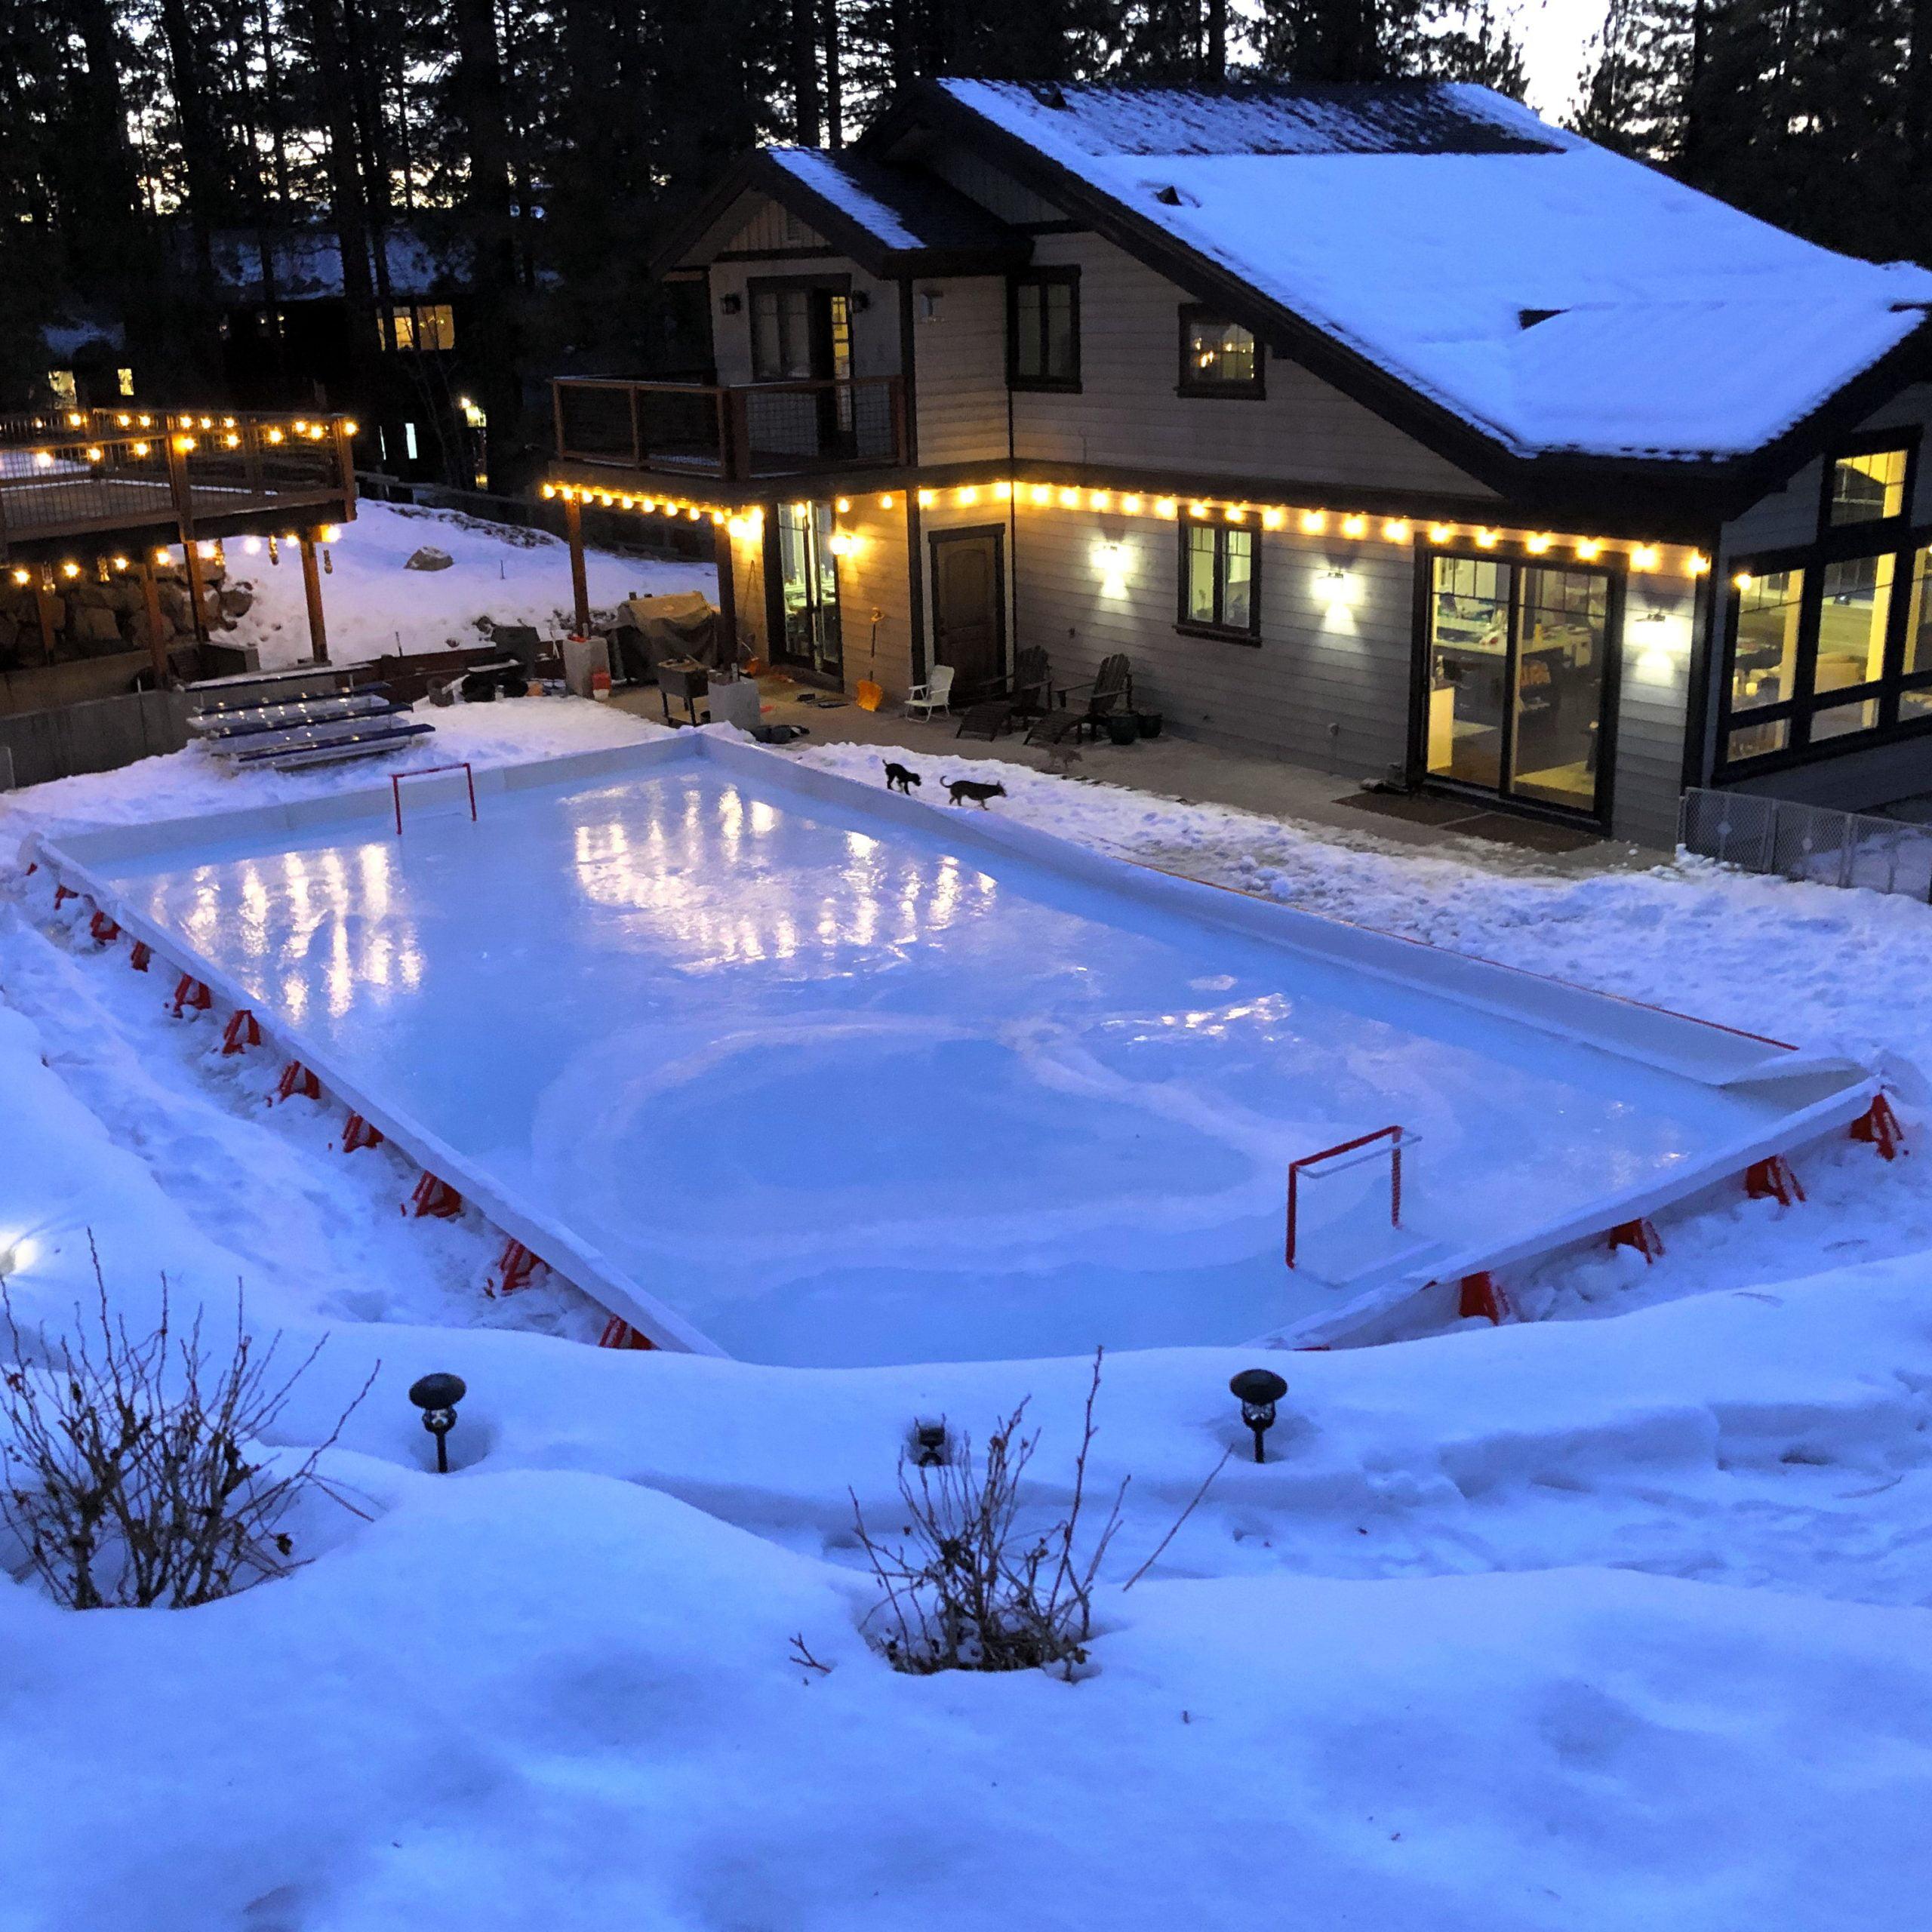 Ice N Go Pro Rink Kit 20 X 40 Backyard Ice Hockey Rink Kit Walmart Canada Best backyard ice rink kit canada